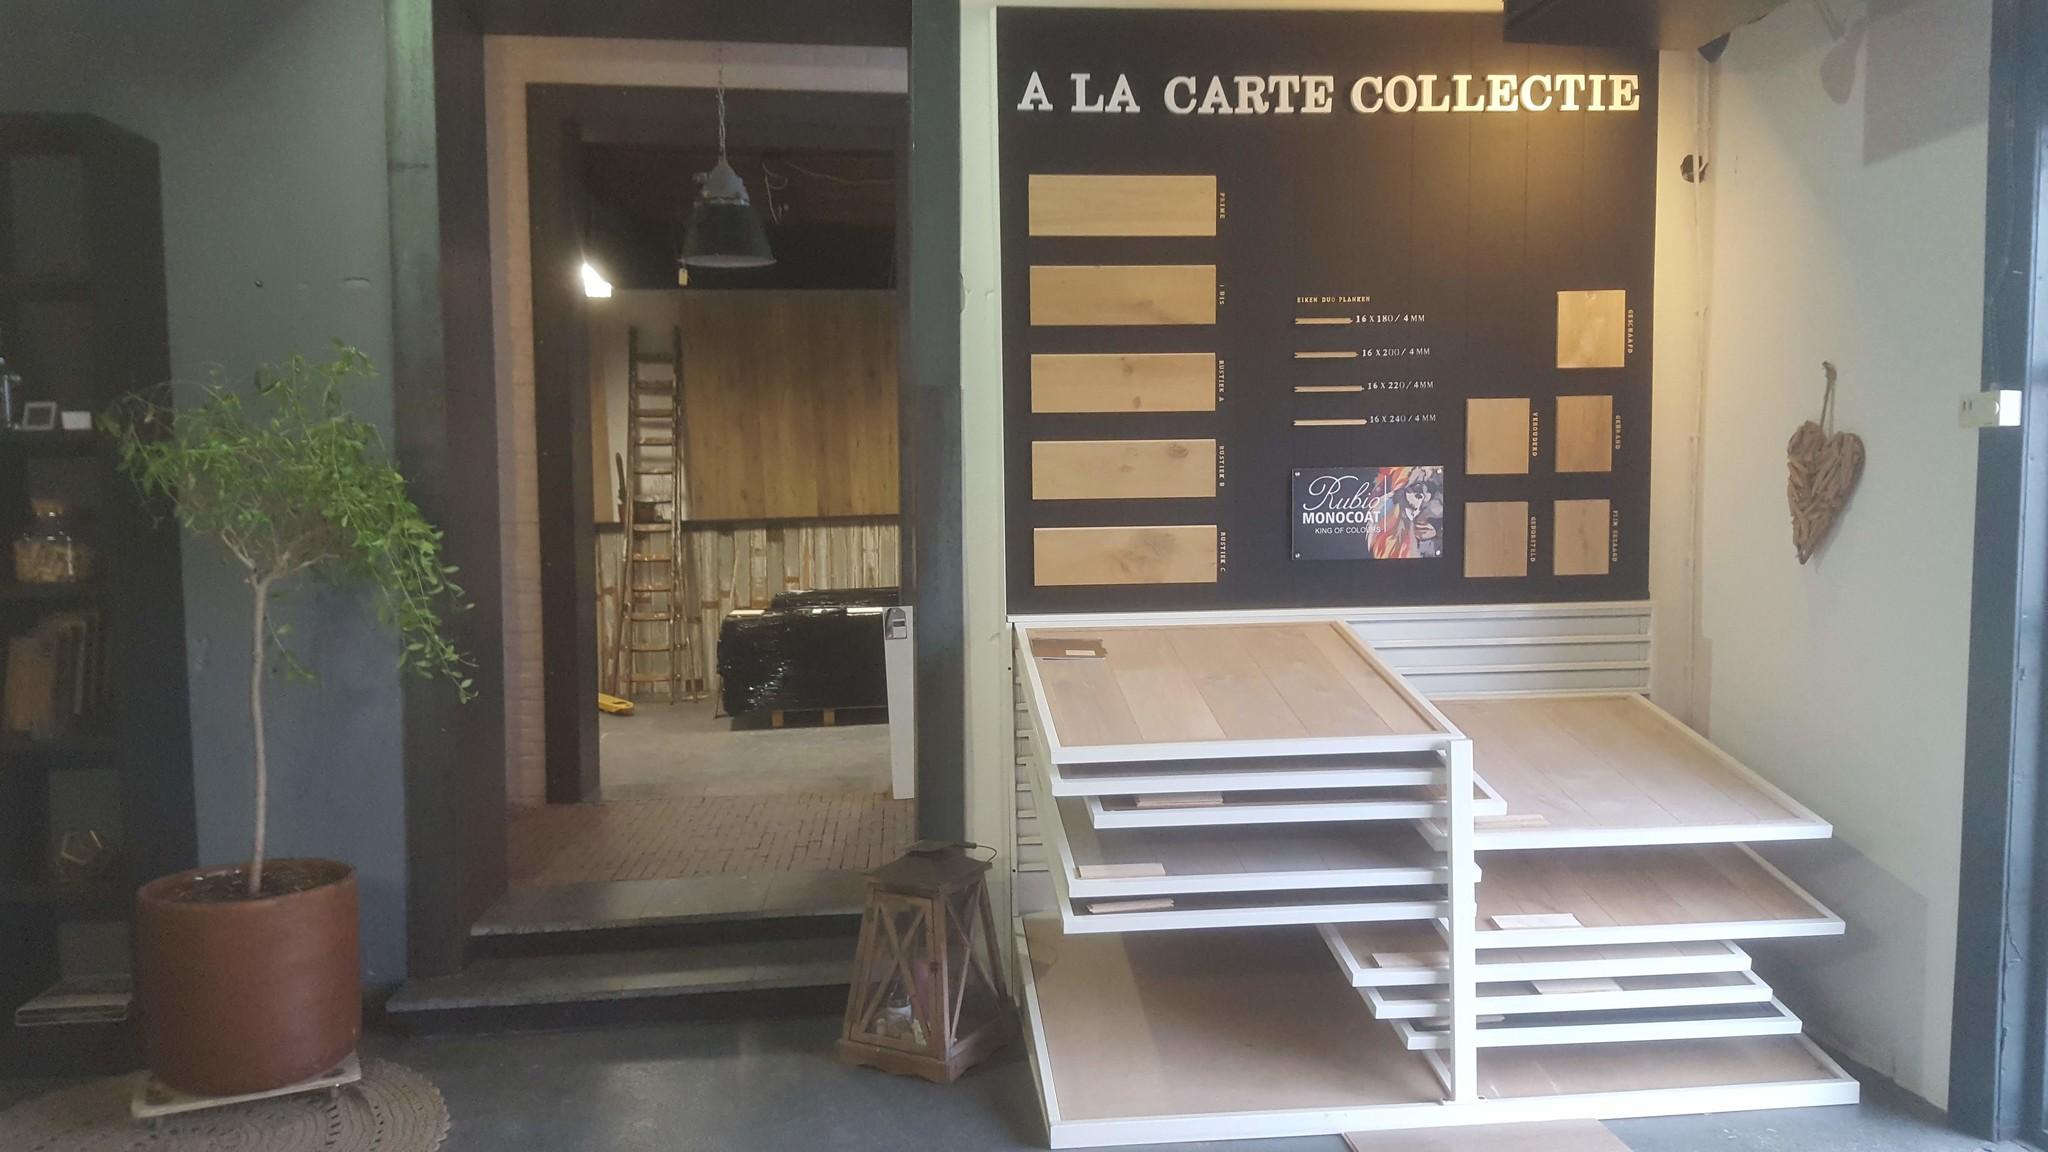 A La Carte collectie